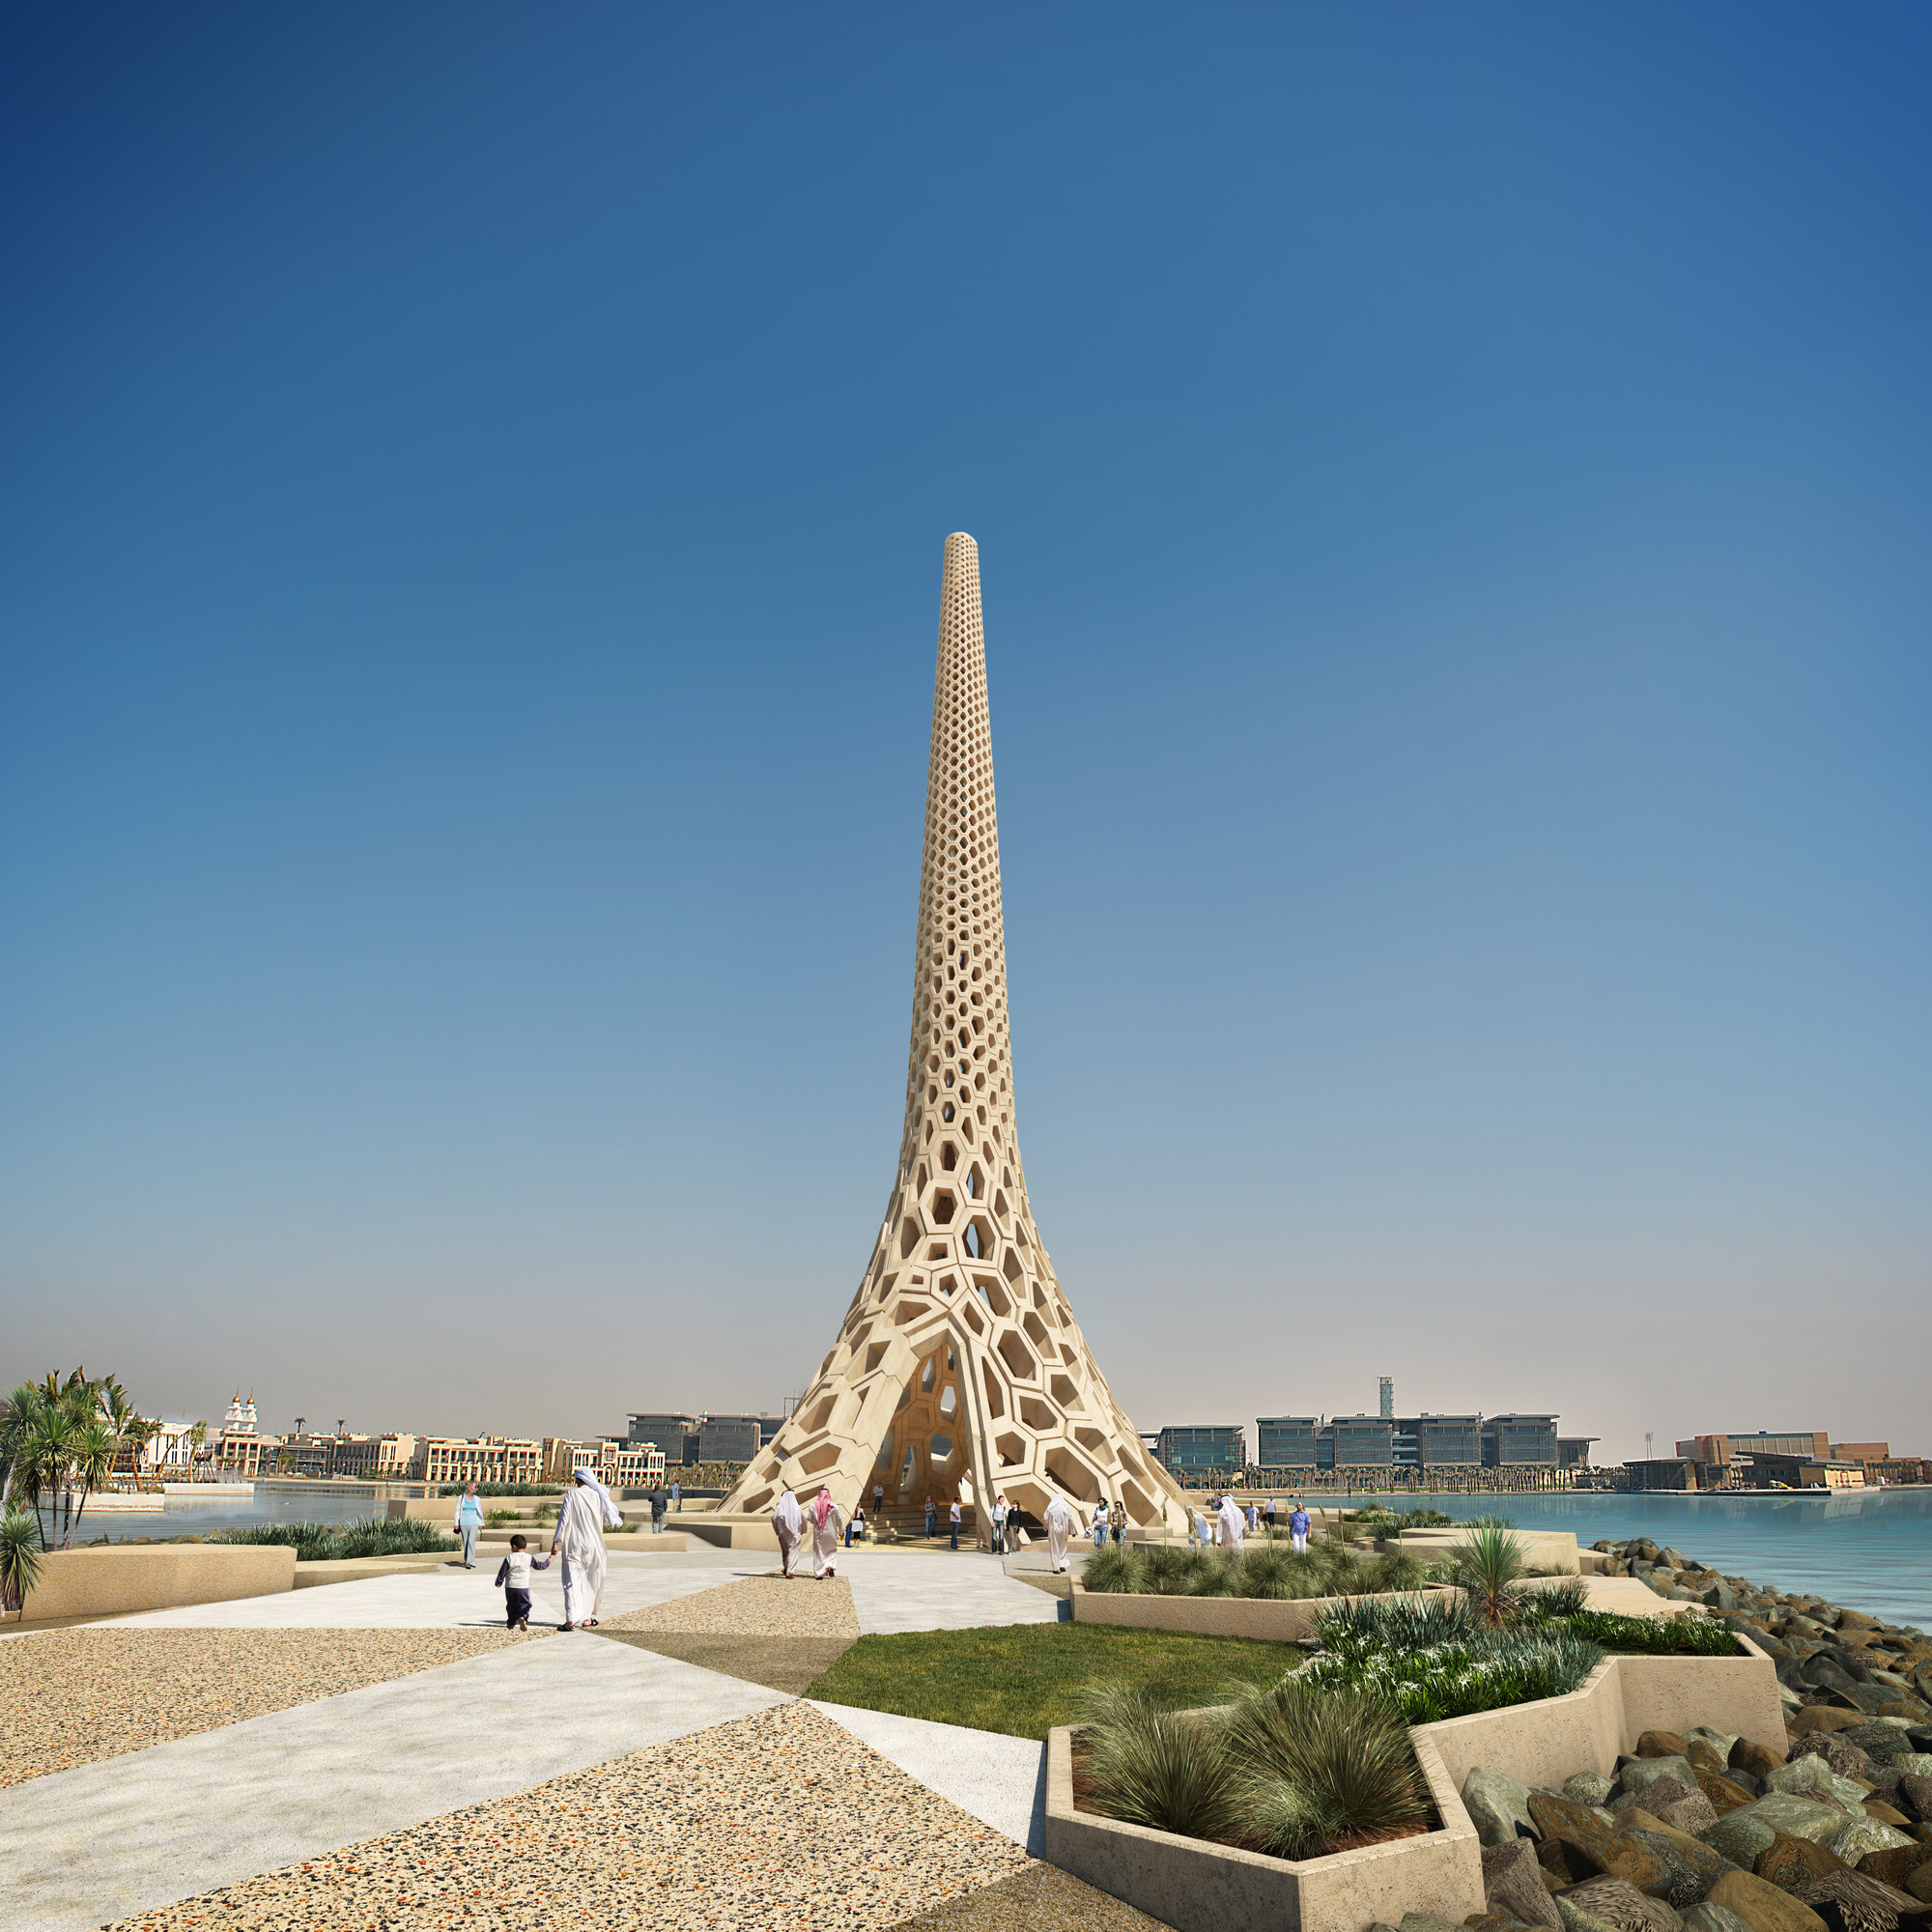 Arte e Arquitetura: Breakwater Beacon, 60 metros de concreto branco por UAP Design Studio, Cortesia de UAP